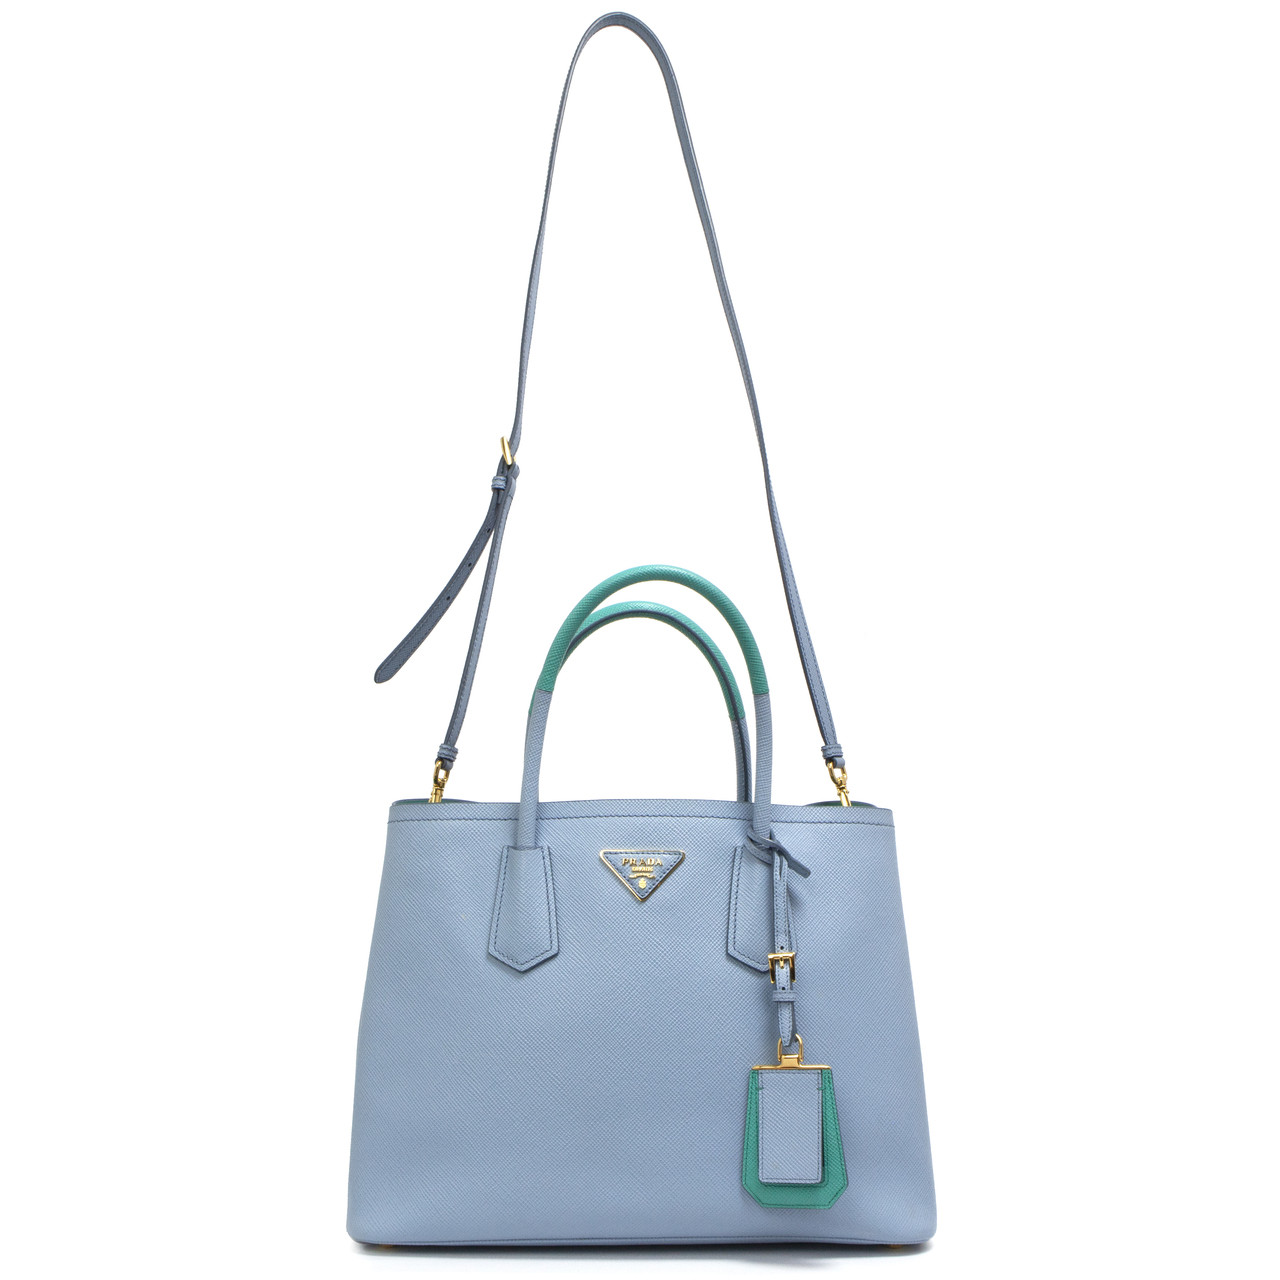 052d739db2c8bb Prada Astrale Blue & Jade Green Saffiano Cuir Small Double Bag ...